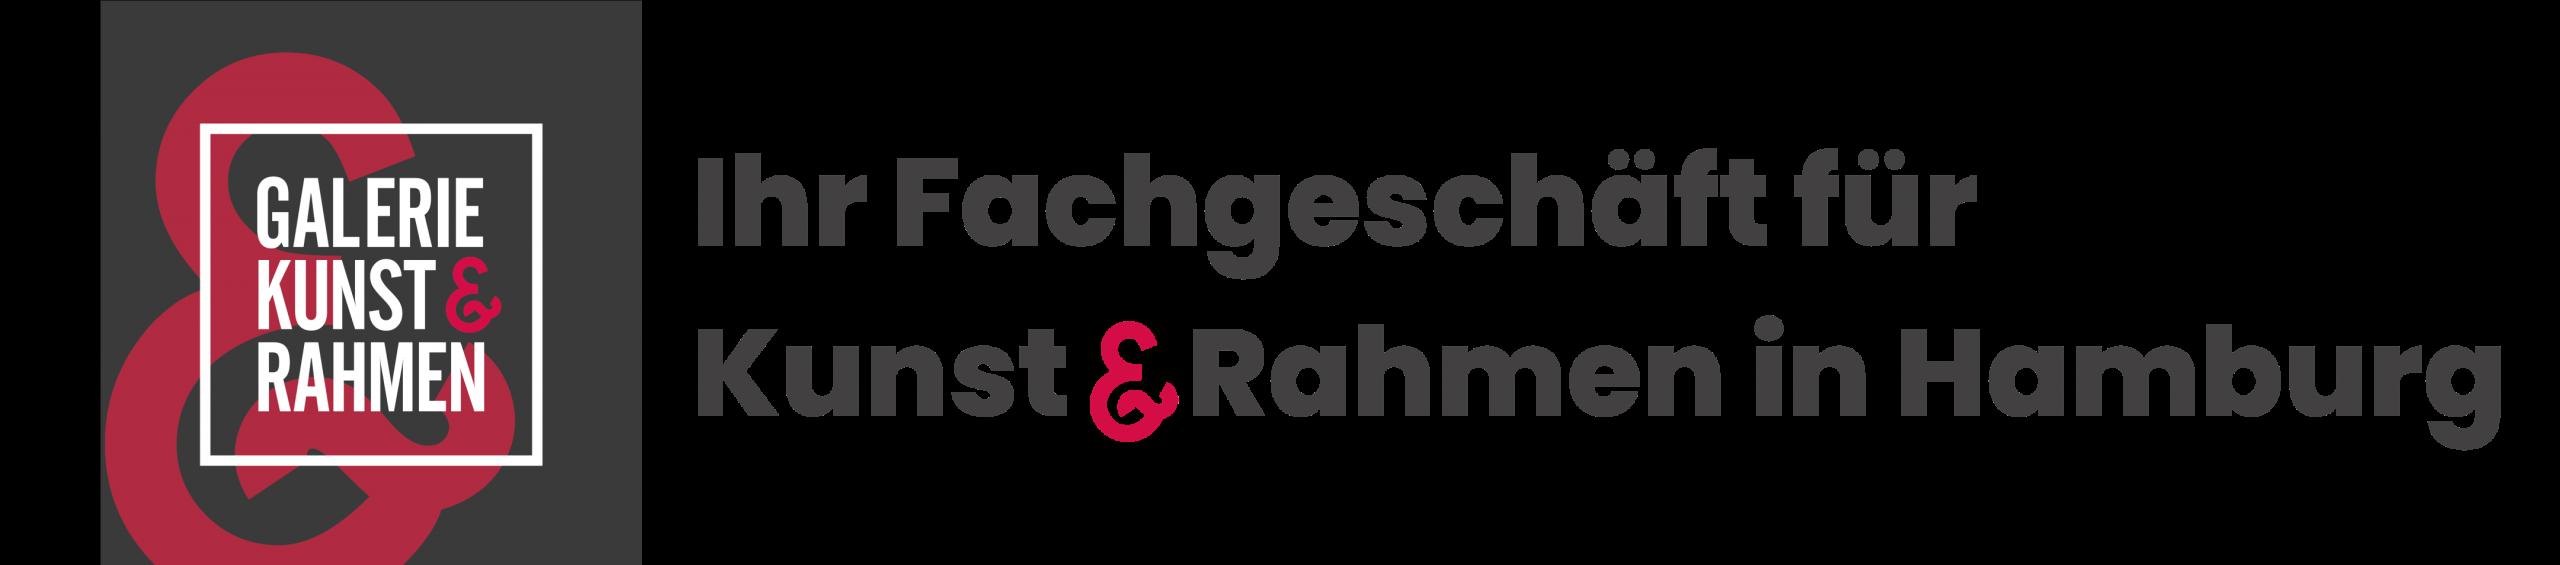 Kunst & Rahmen Hamburg